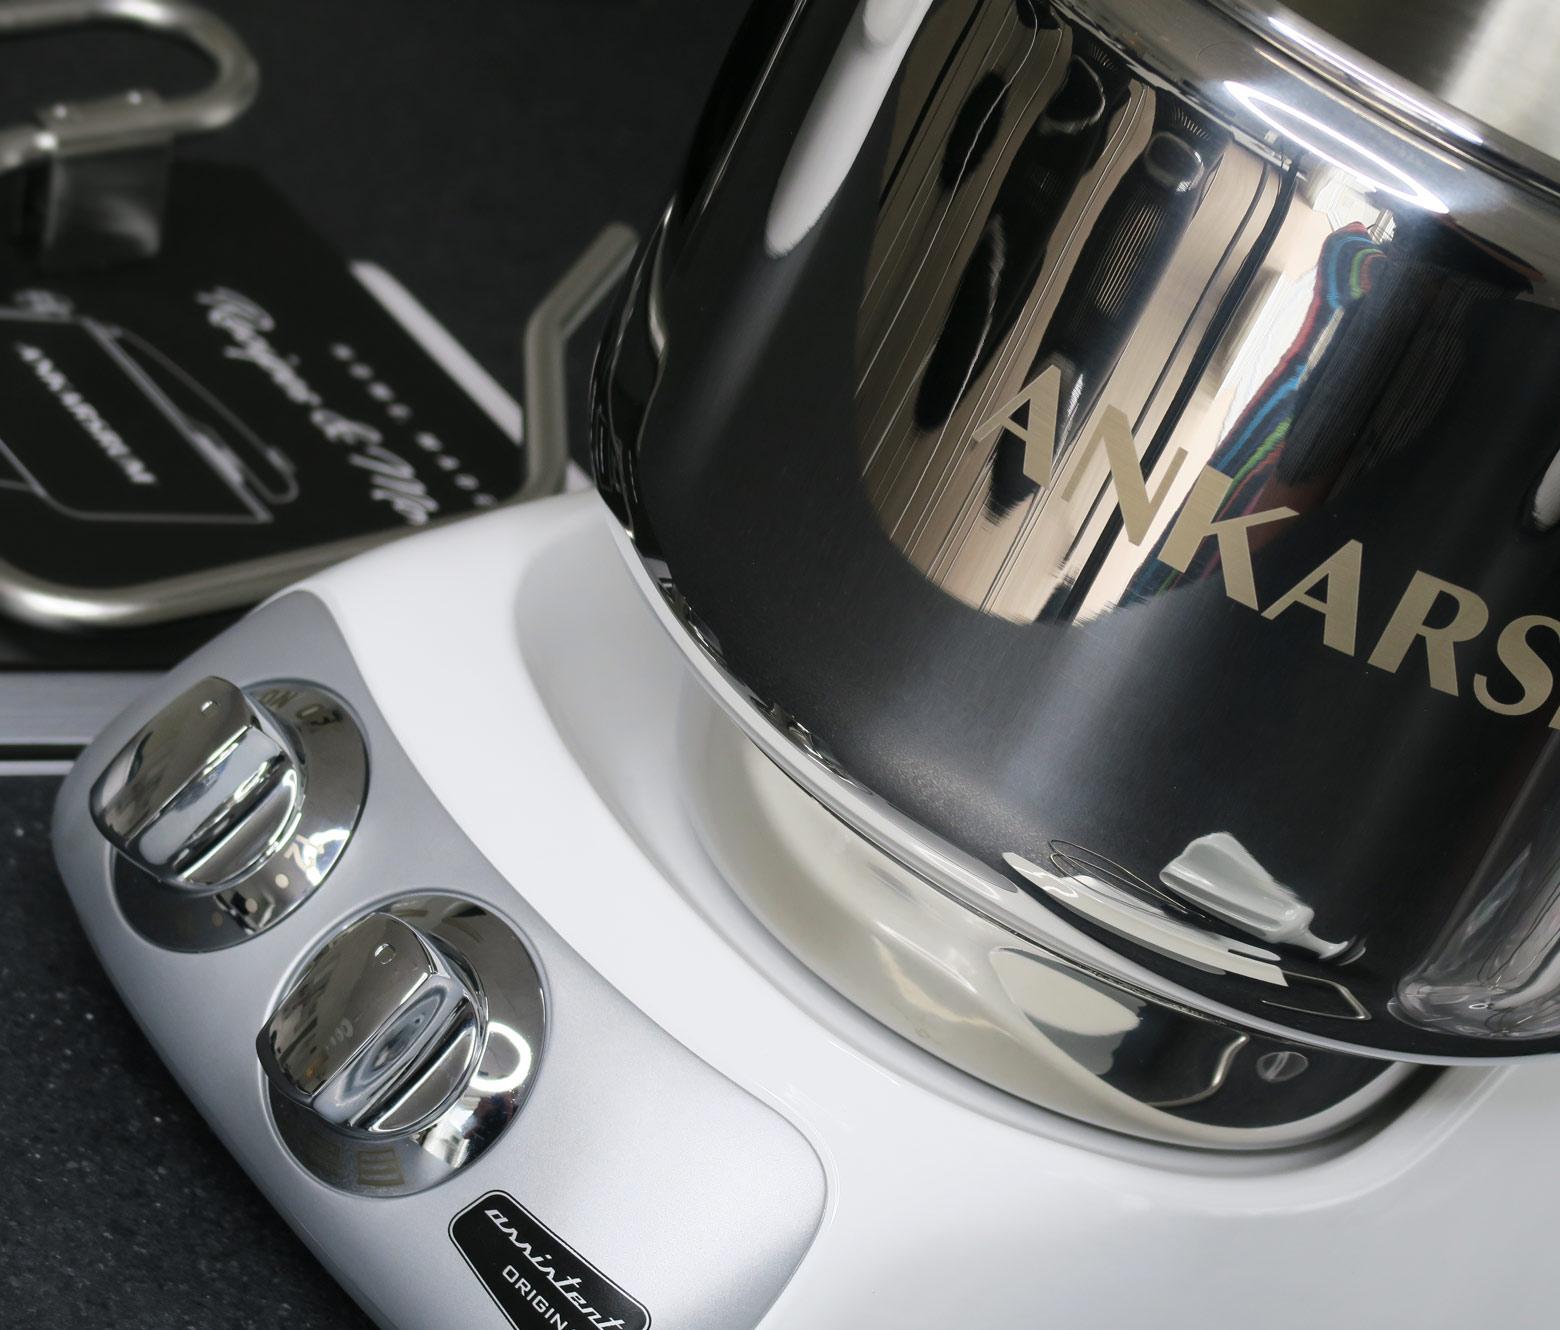 Køkkenmaskine test - Ankarsrum Assistent AKM 6230